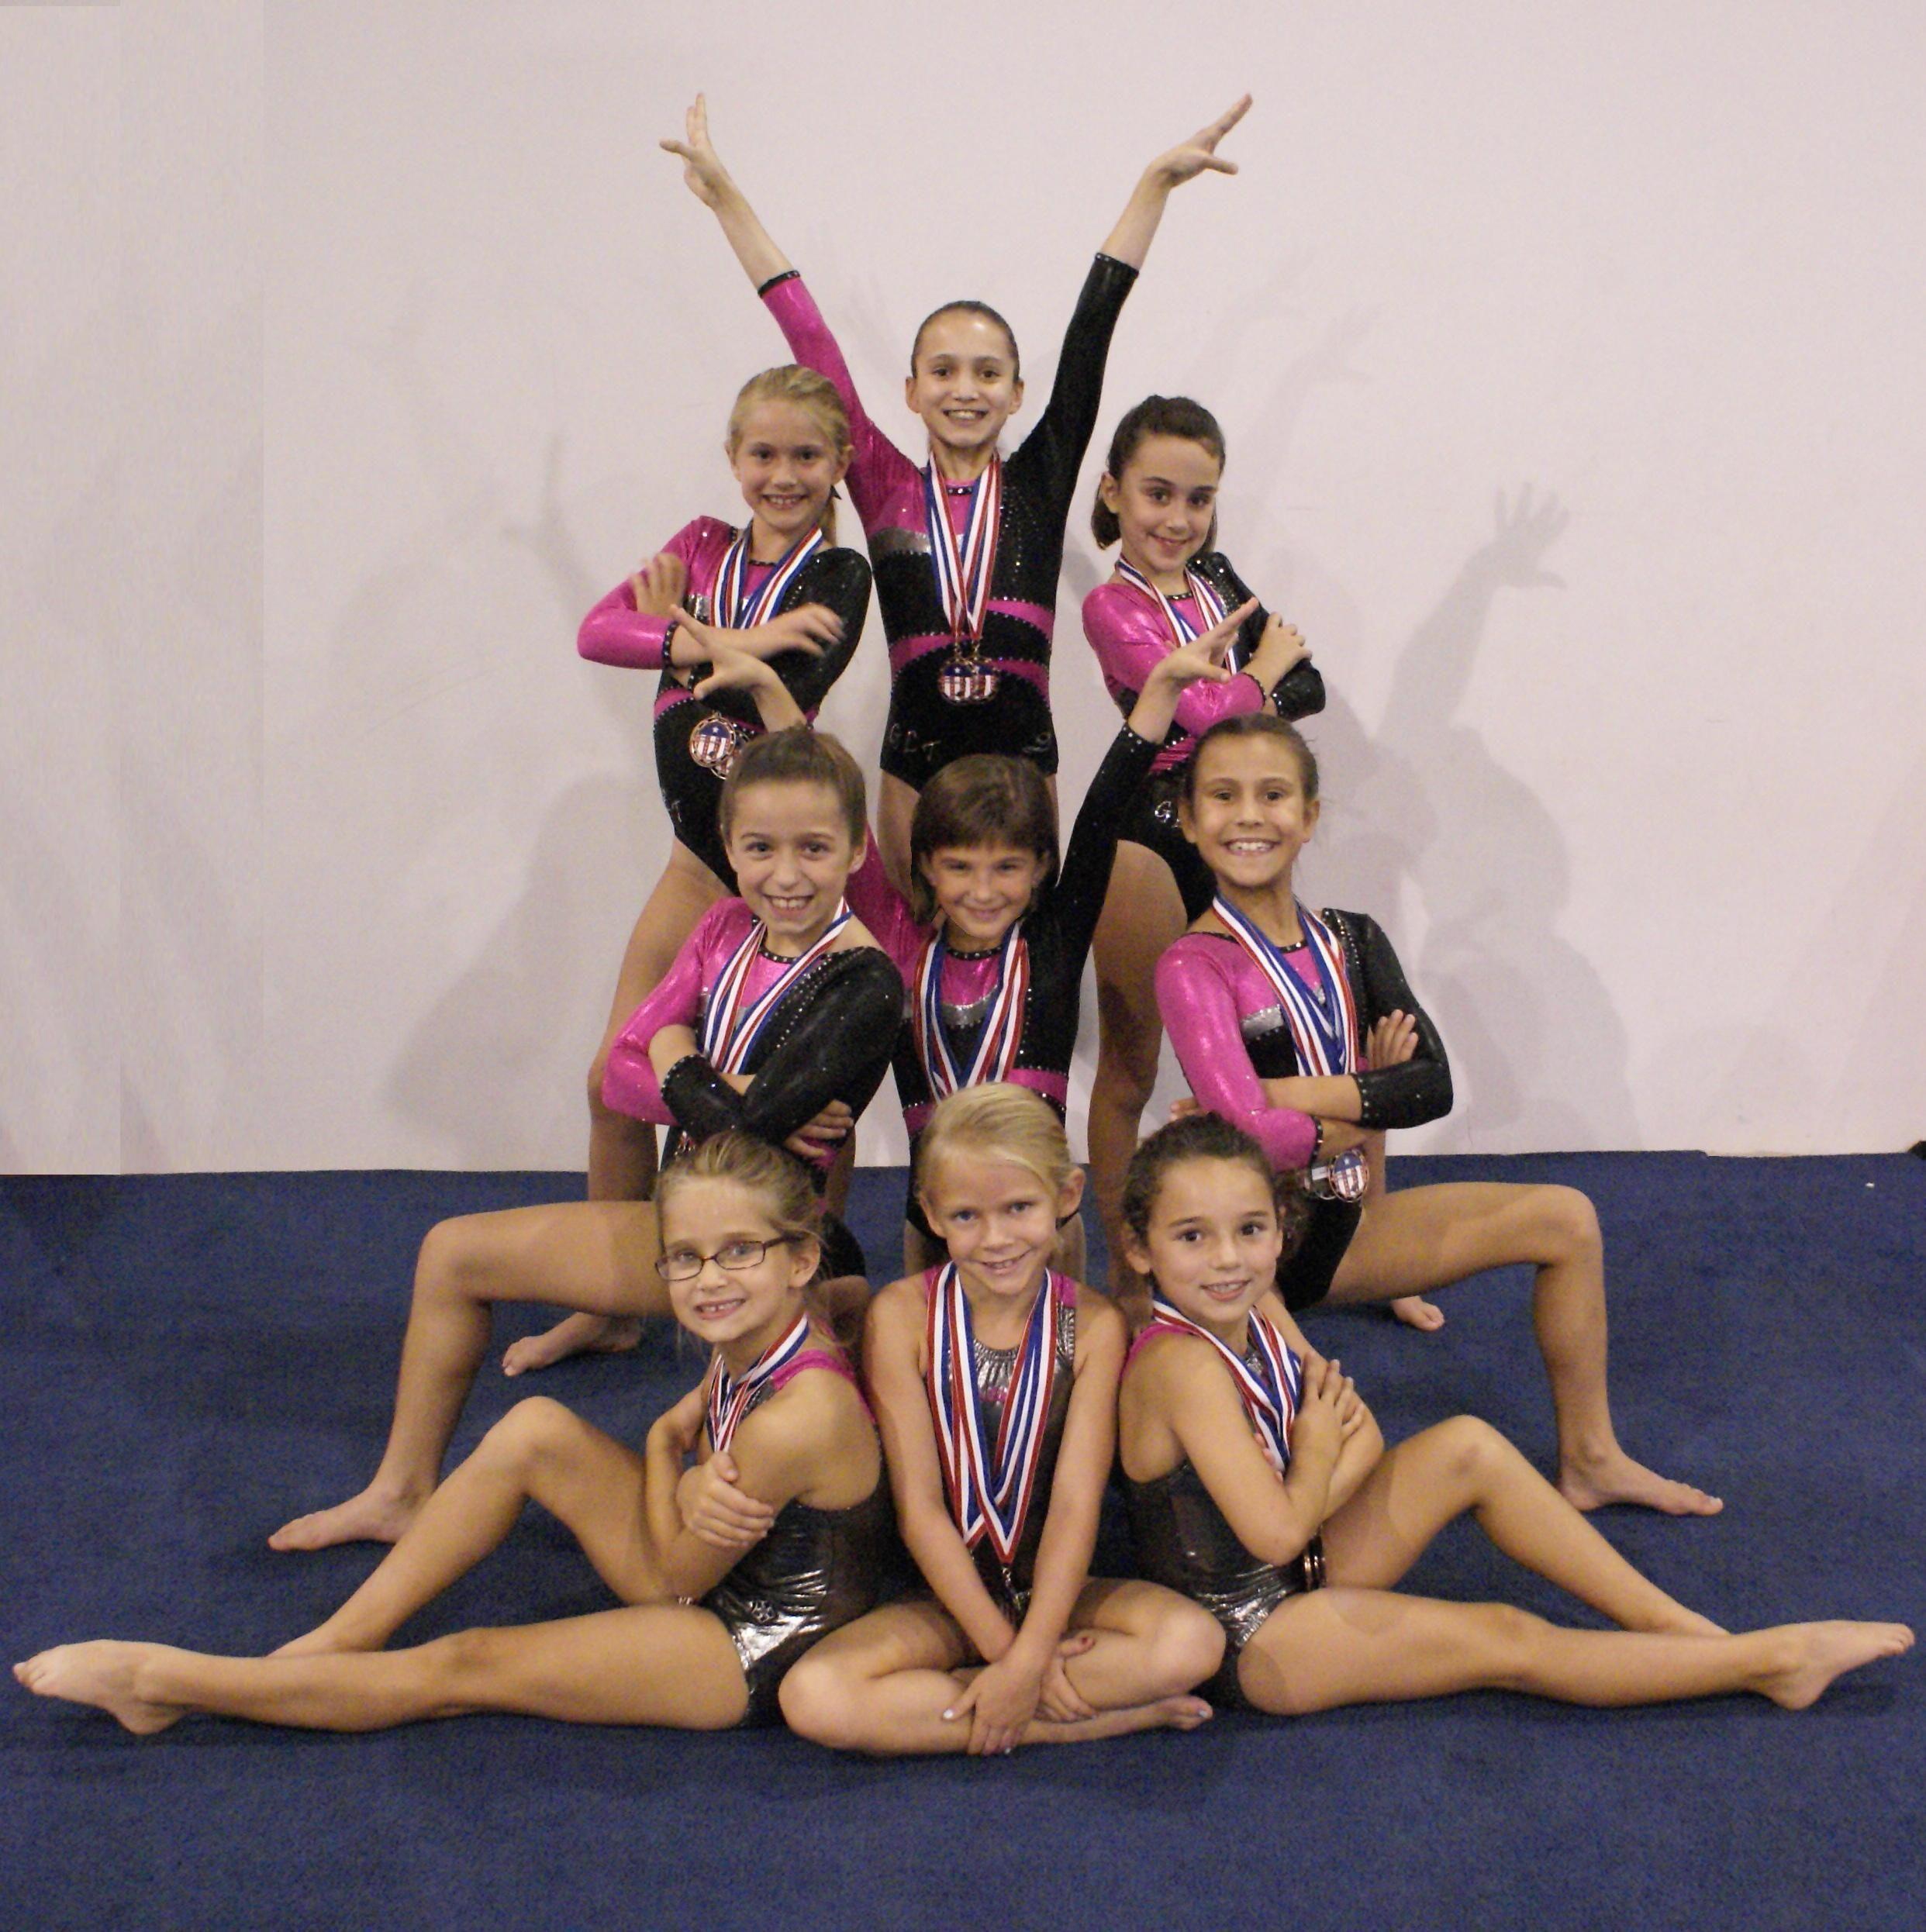 Pin By Mckenzie Thompson On Gymnastics Pinterest Gymnastics